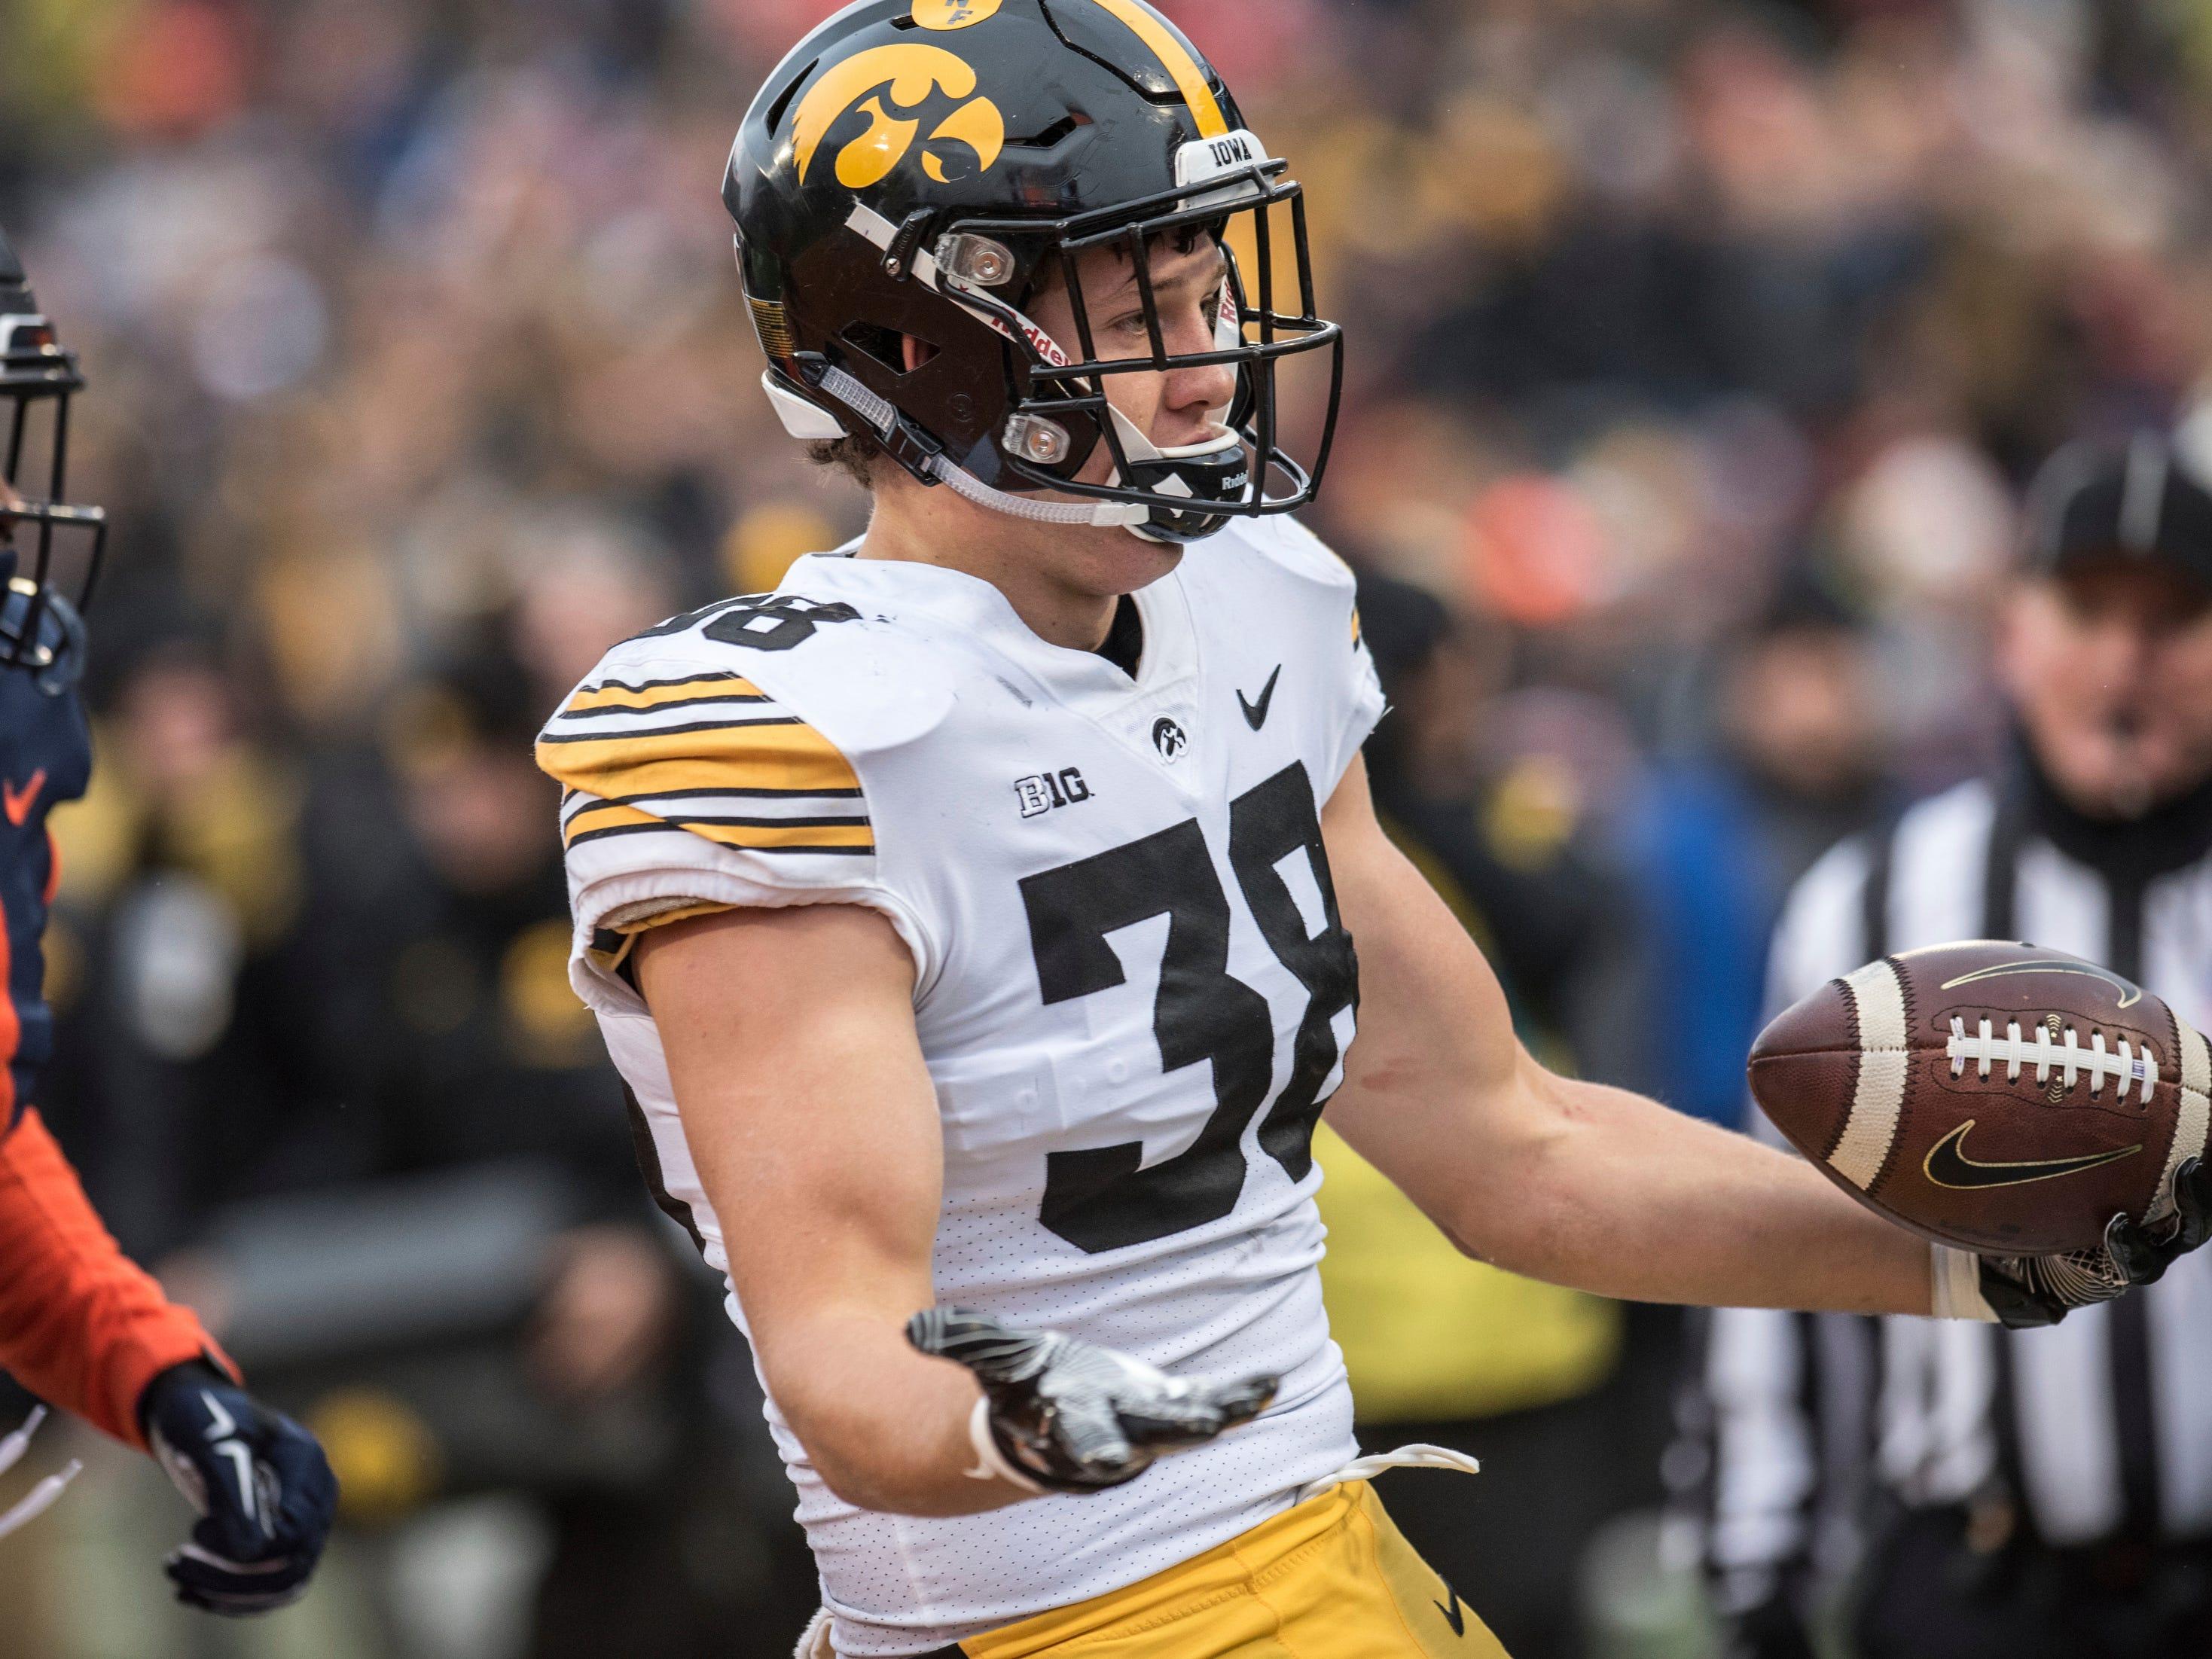 Iowa tight end T.J. Hockenson has a good chance at winning Mackey Award